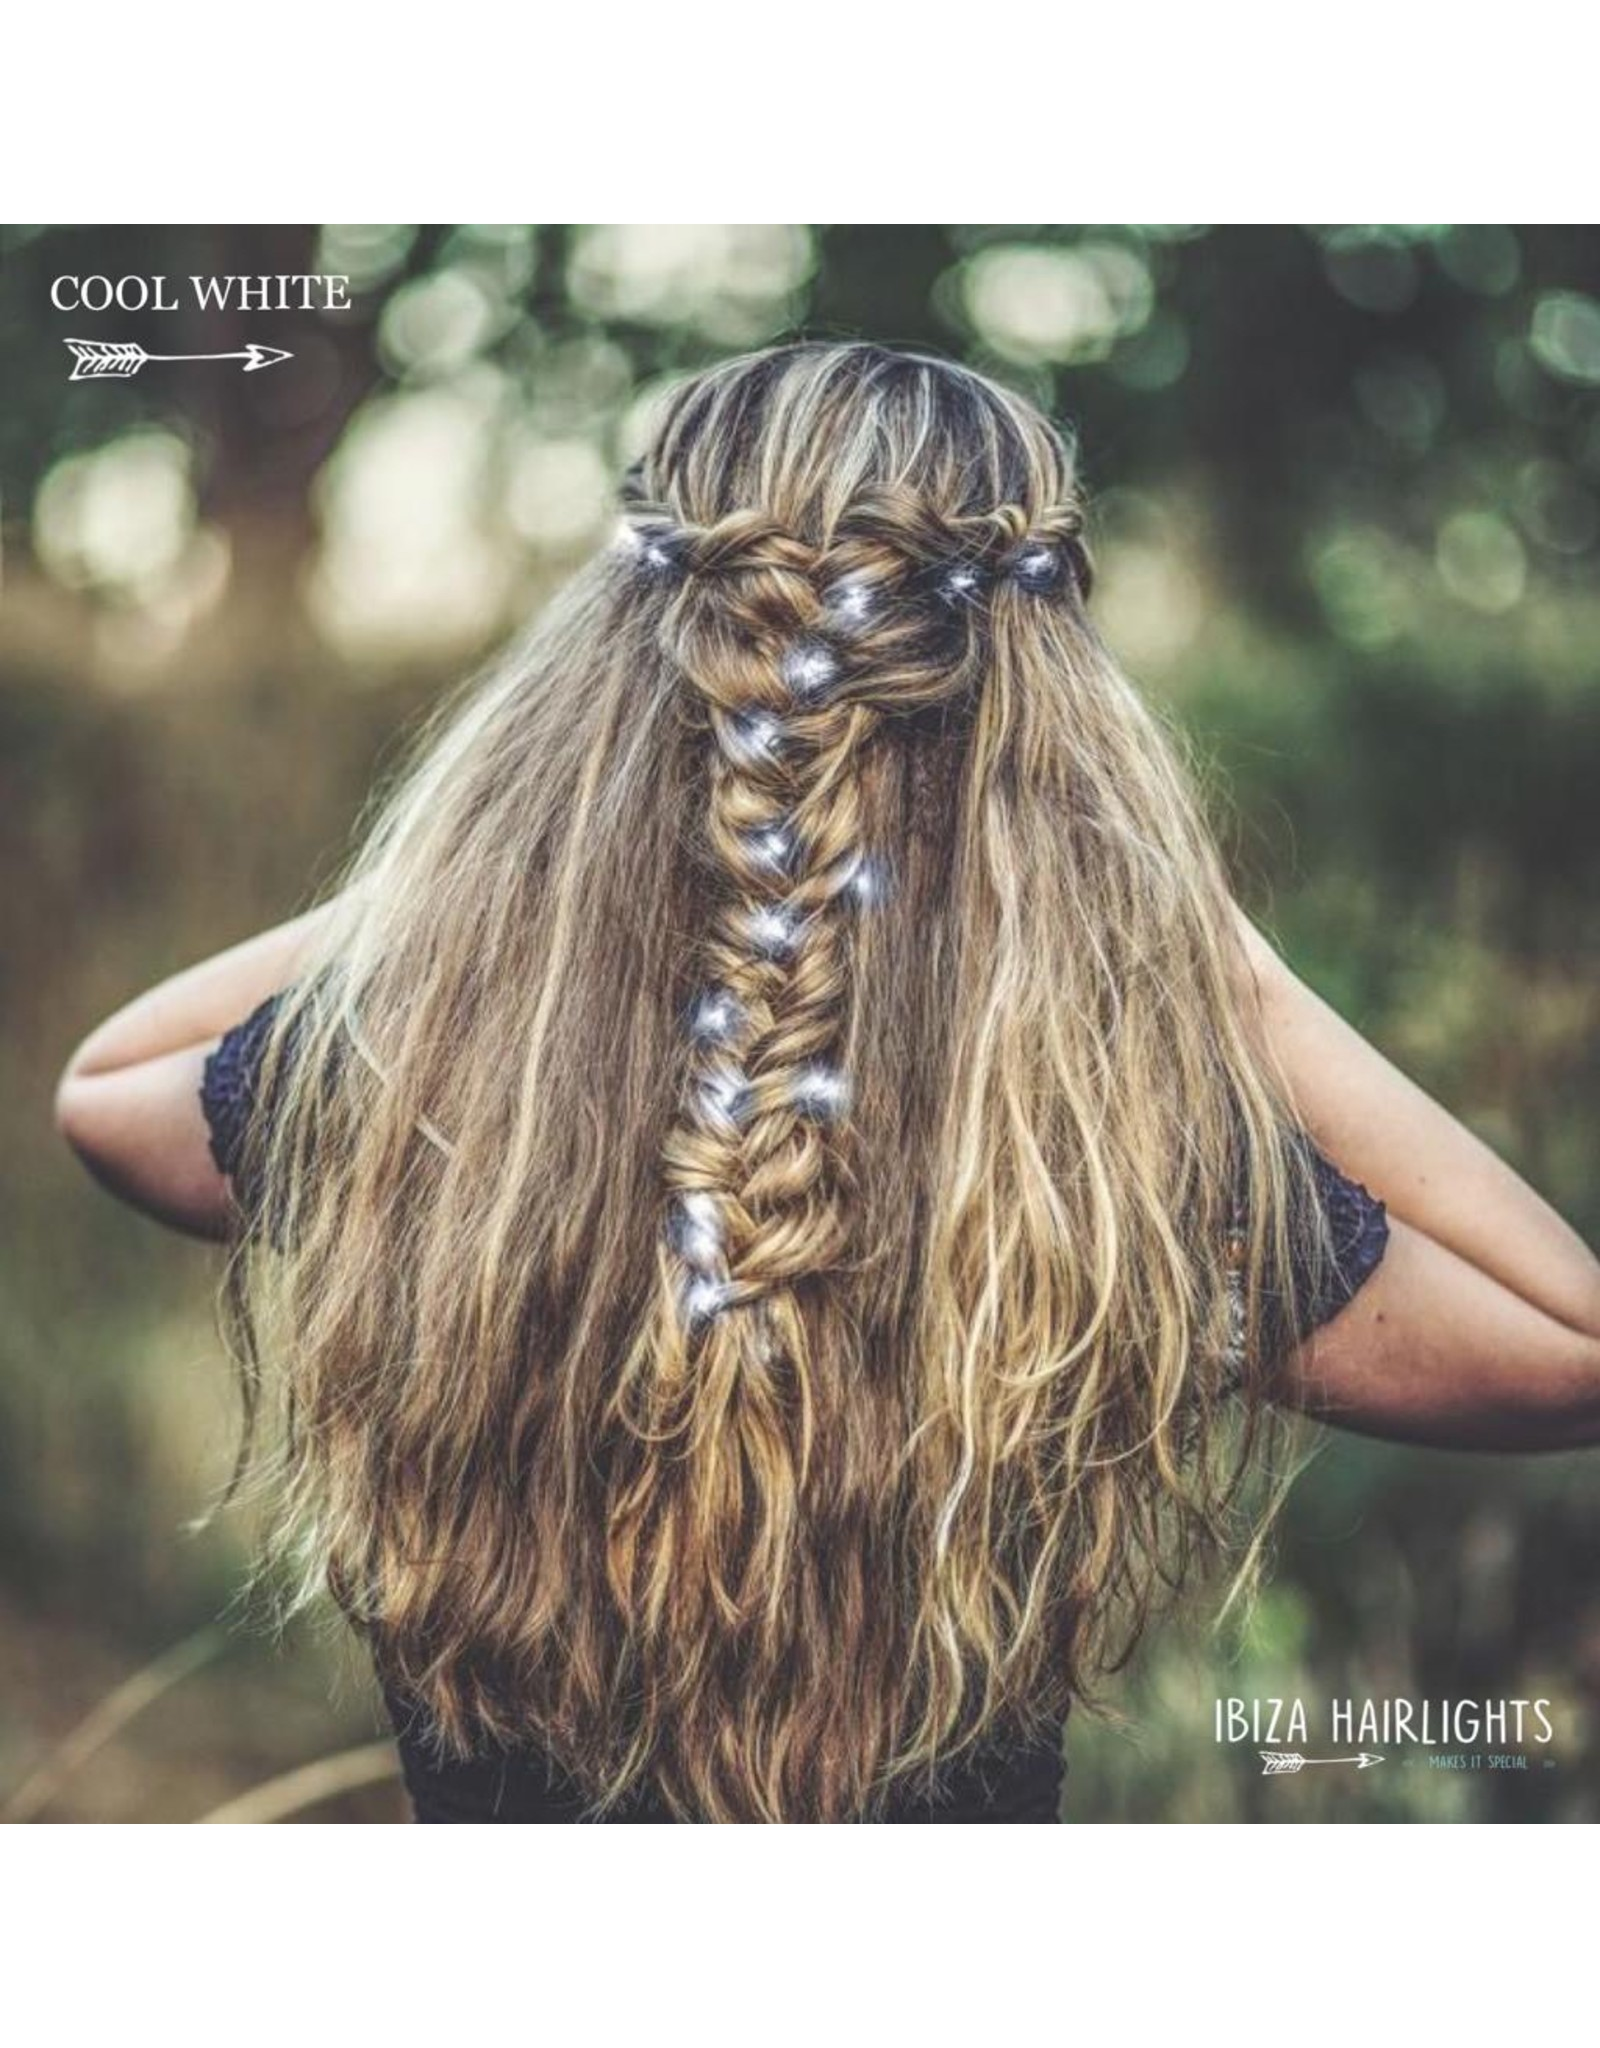 Ibiza Hairwraps Hairlights Cool White